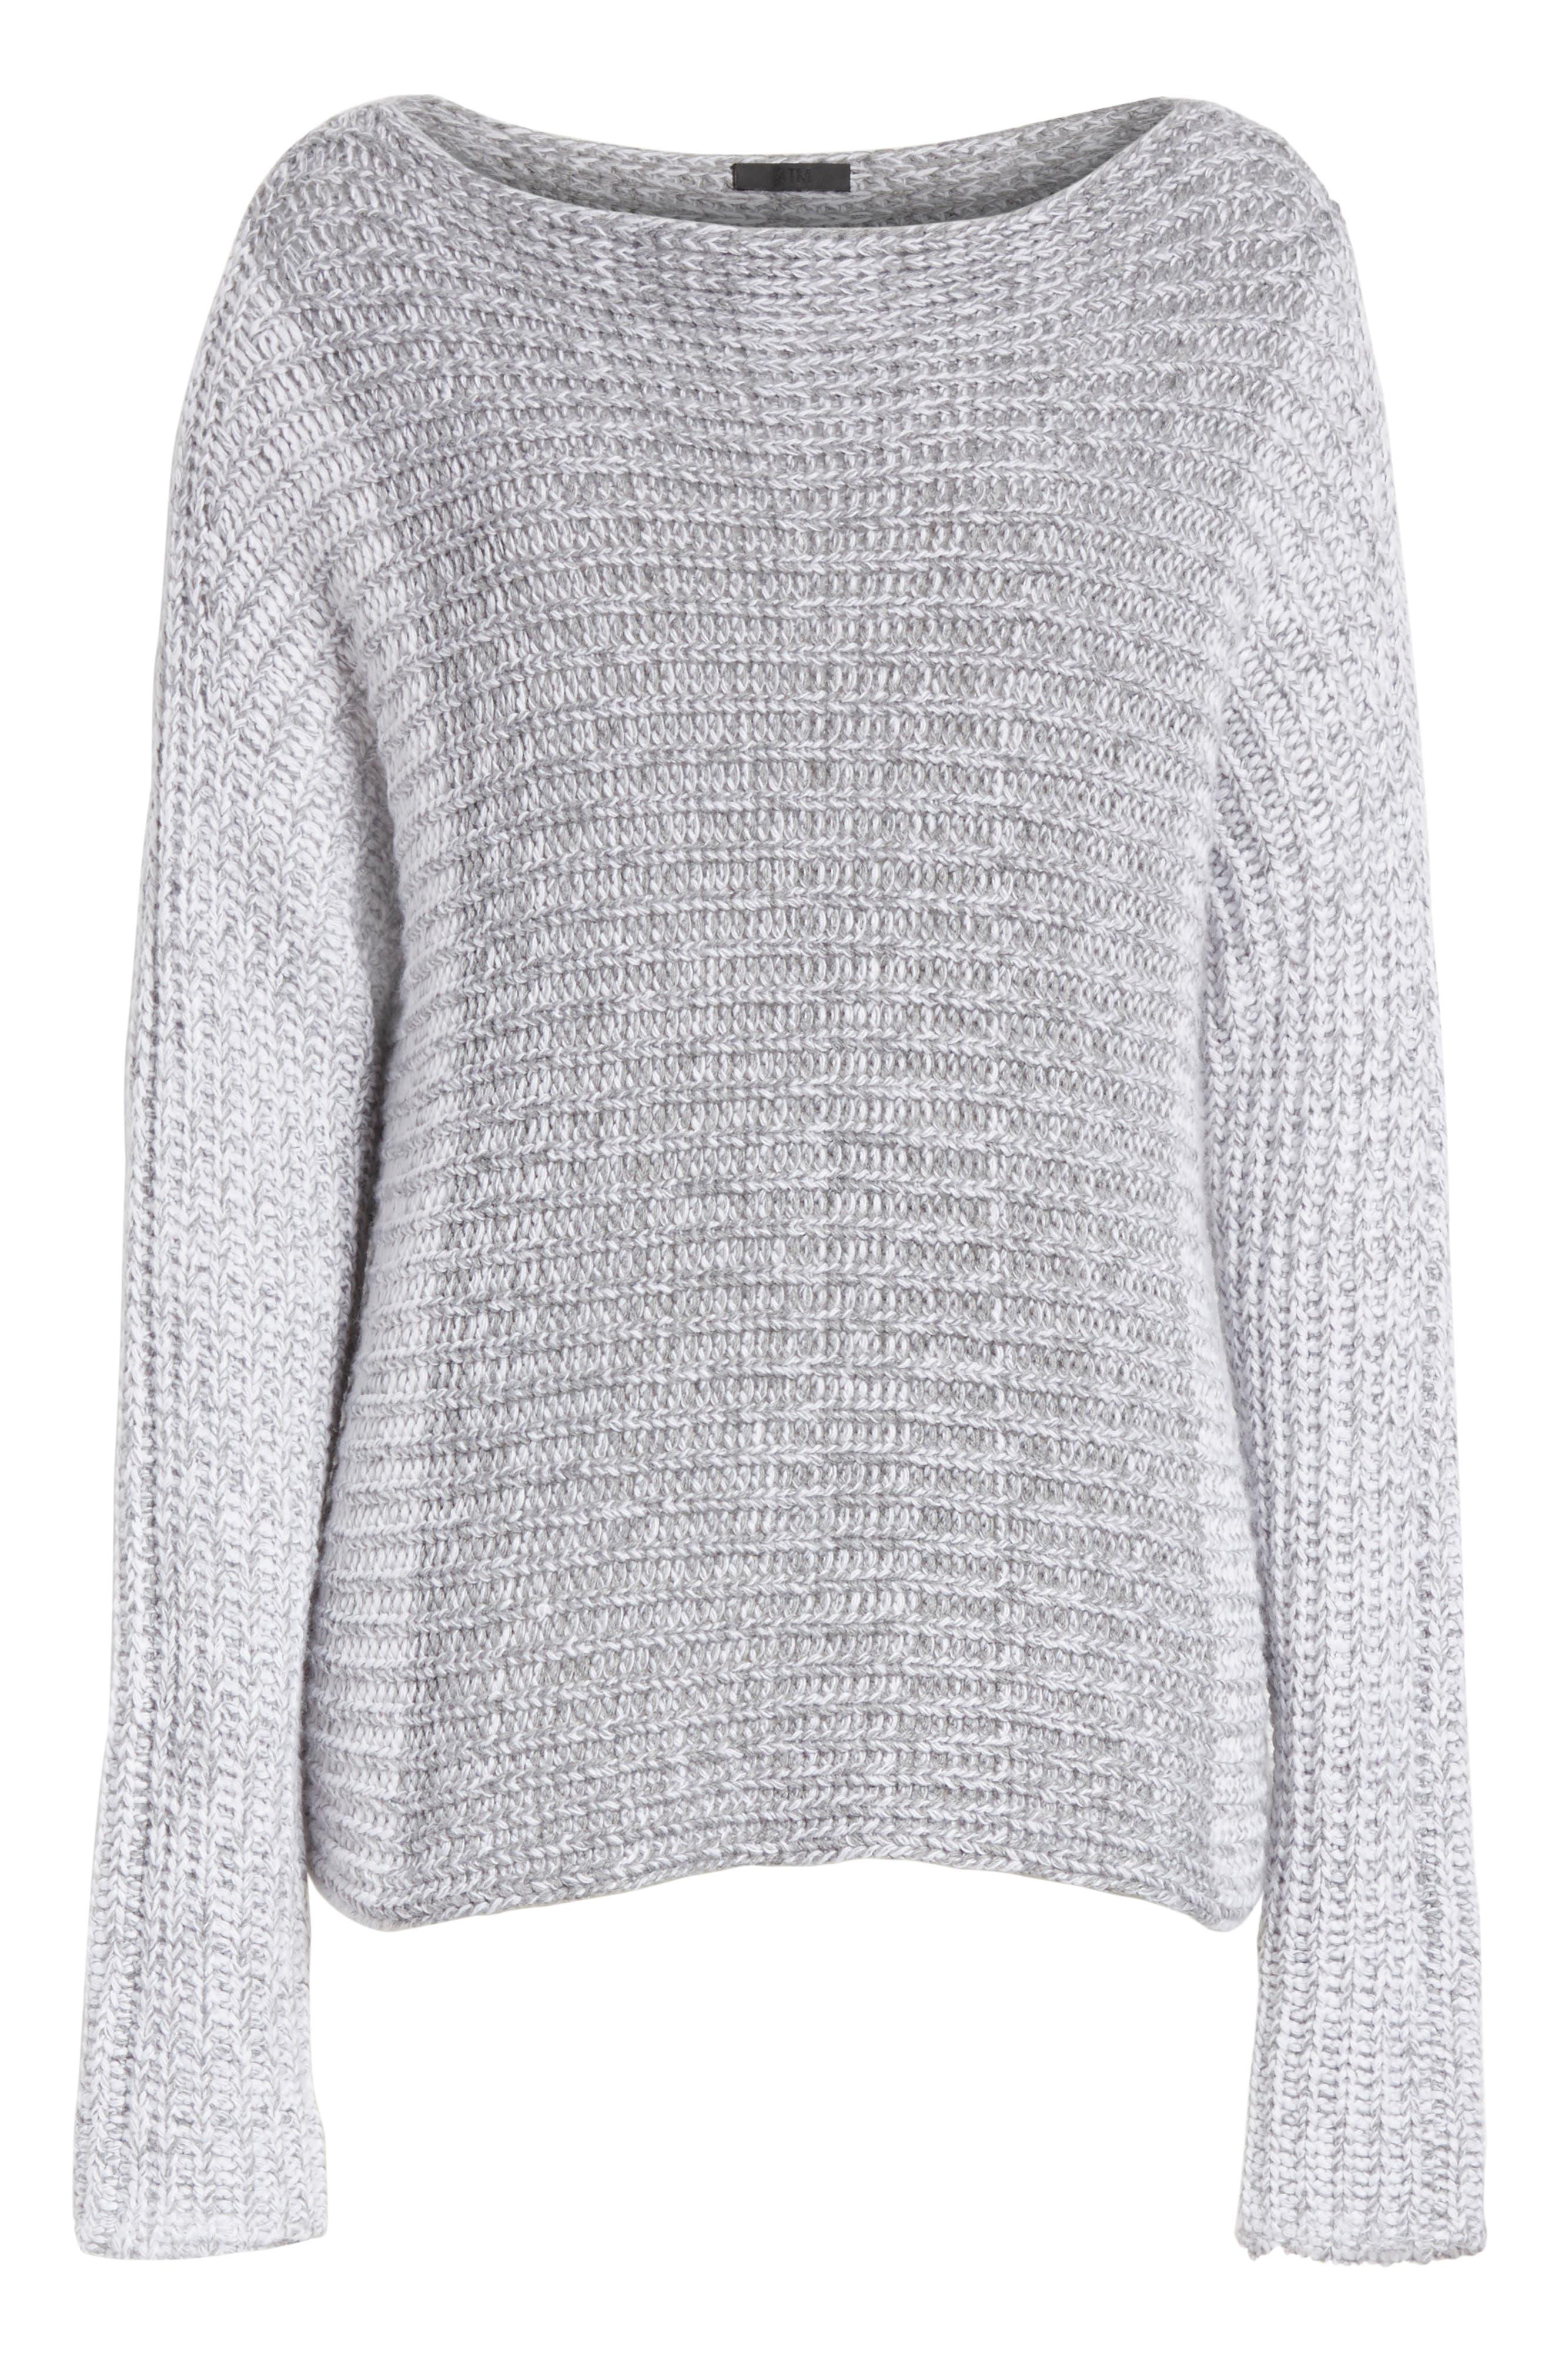 Colorblock Sweater,                             Alternate thumbnail 6, color,                             Grey